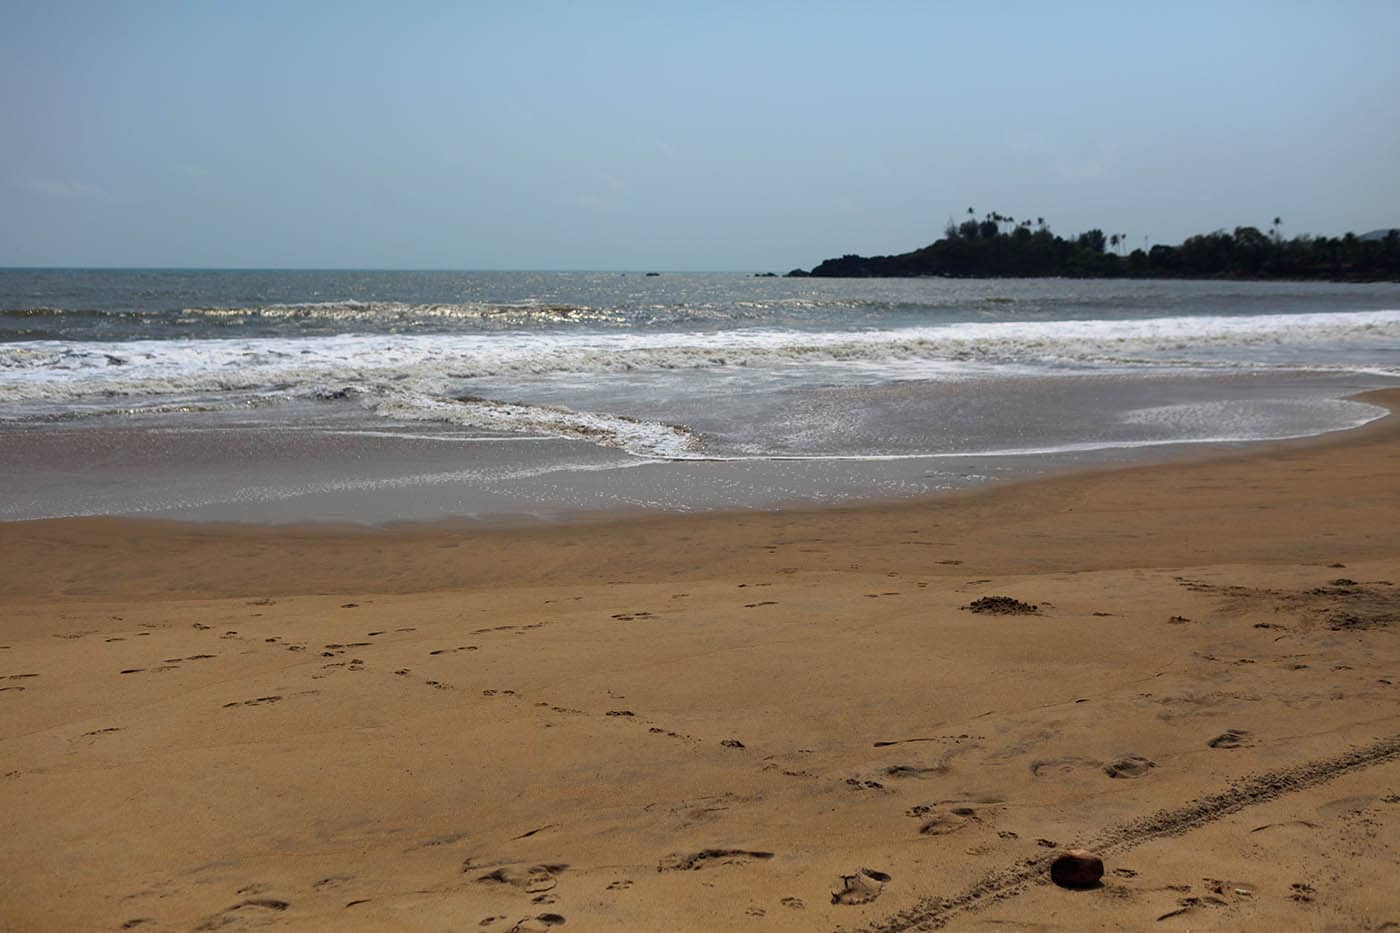 The beach in Palolem, Goa, India.